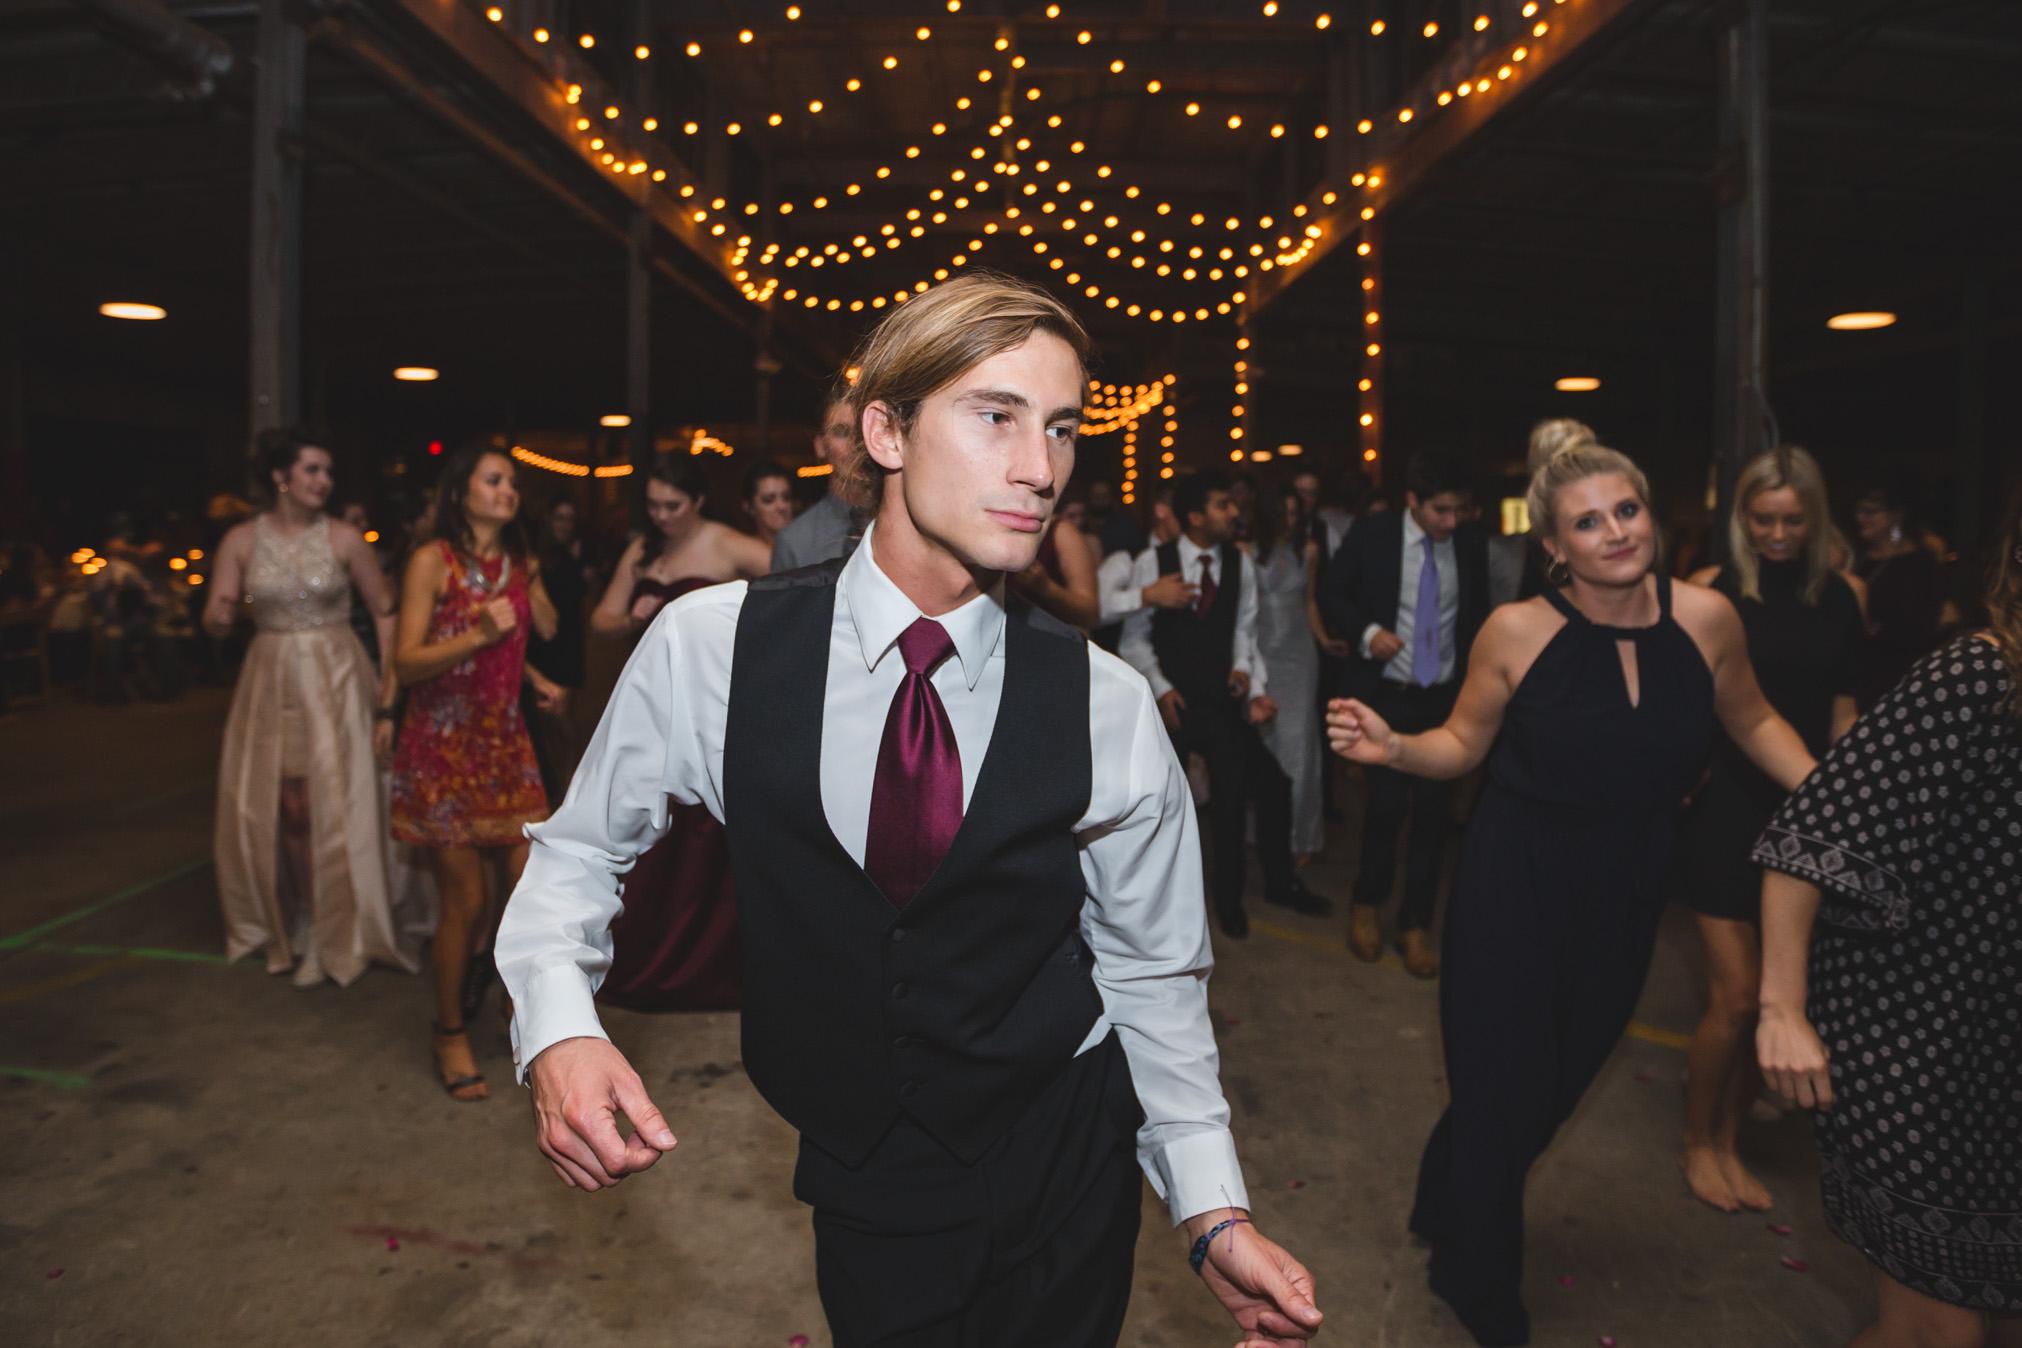 Adam-Szrmack-The-Glass-Factory-Wedding-160.jpg